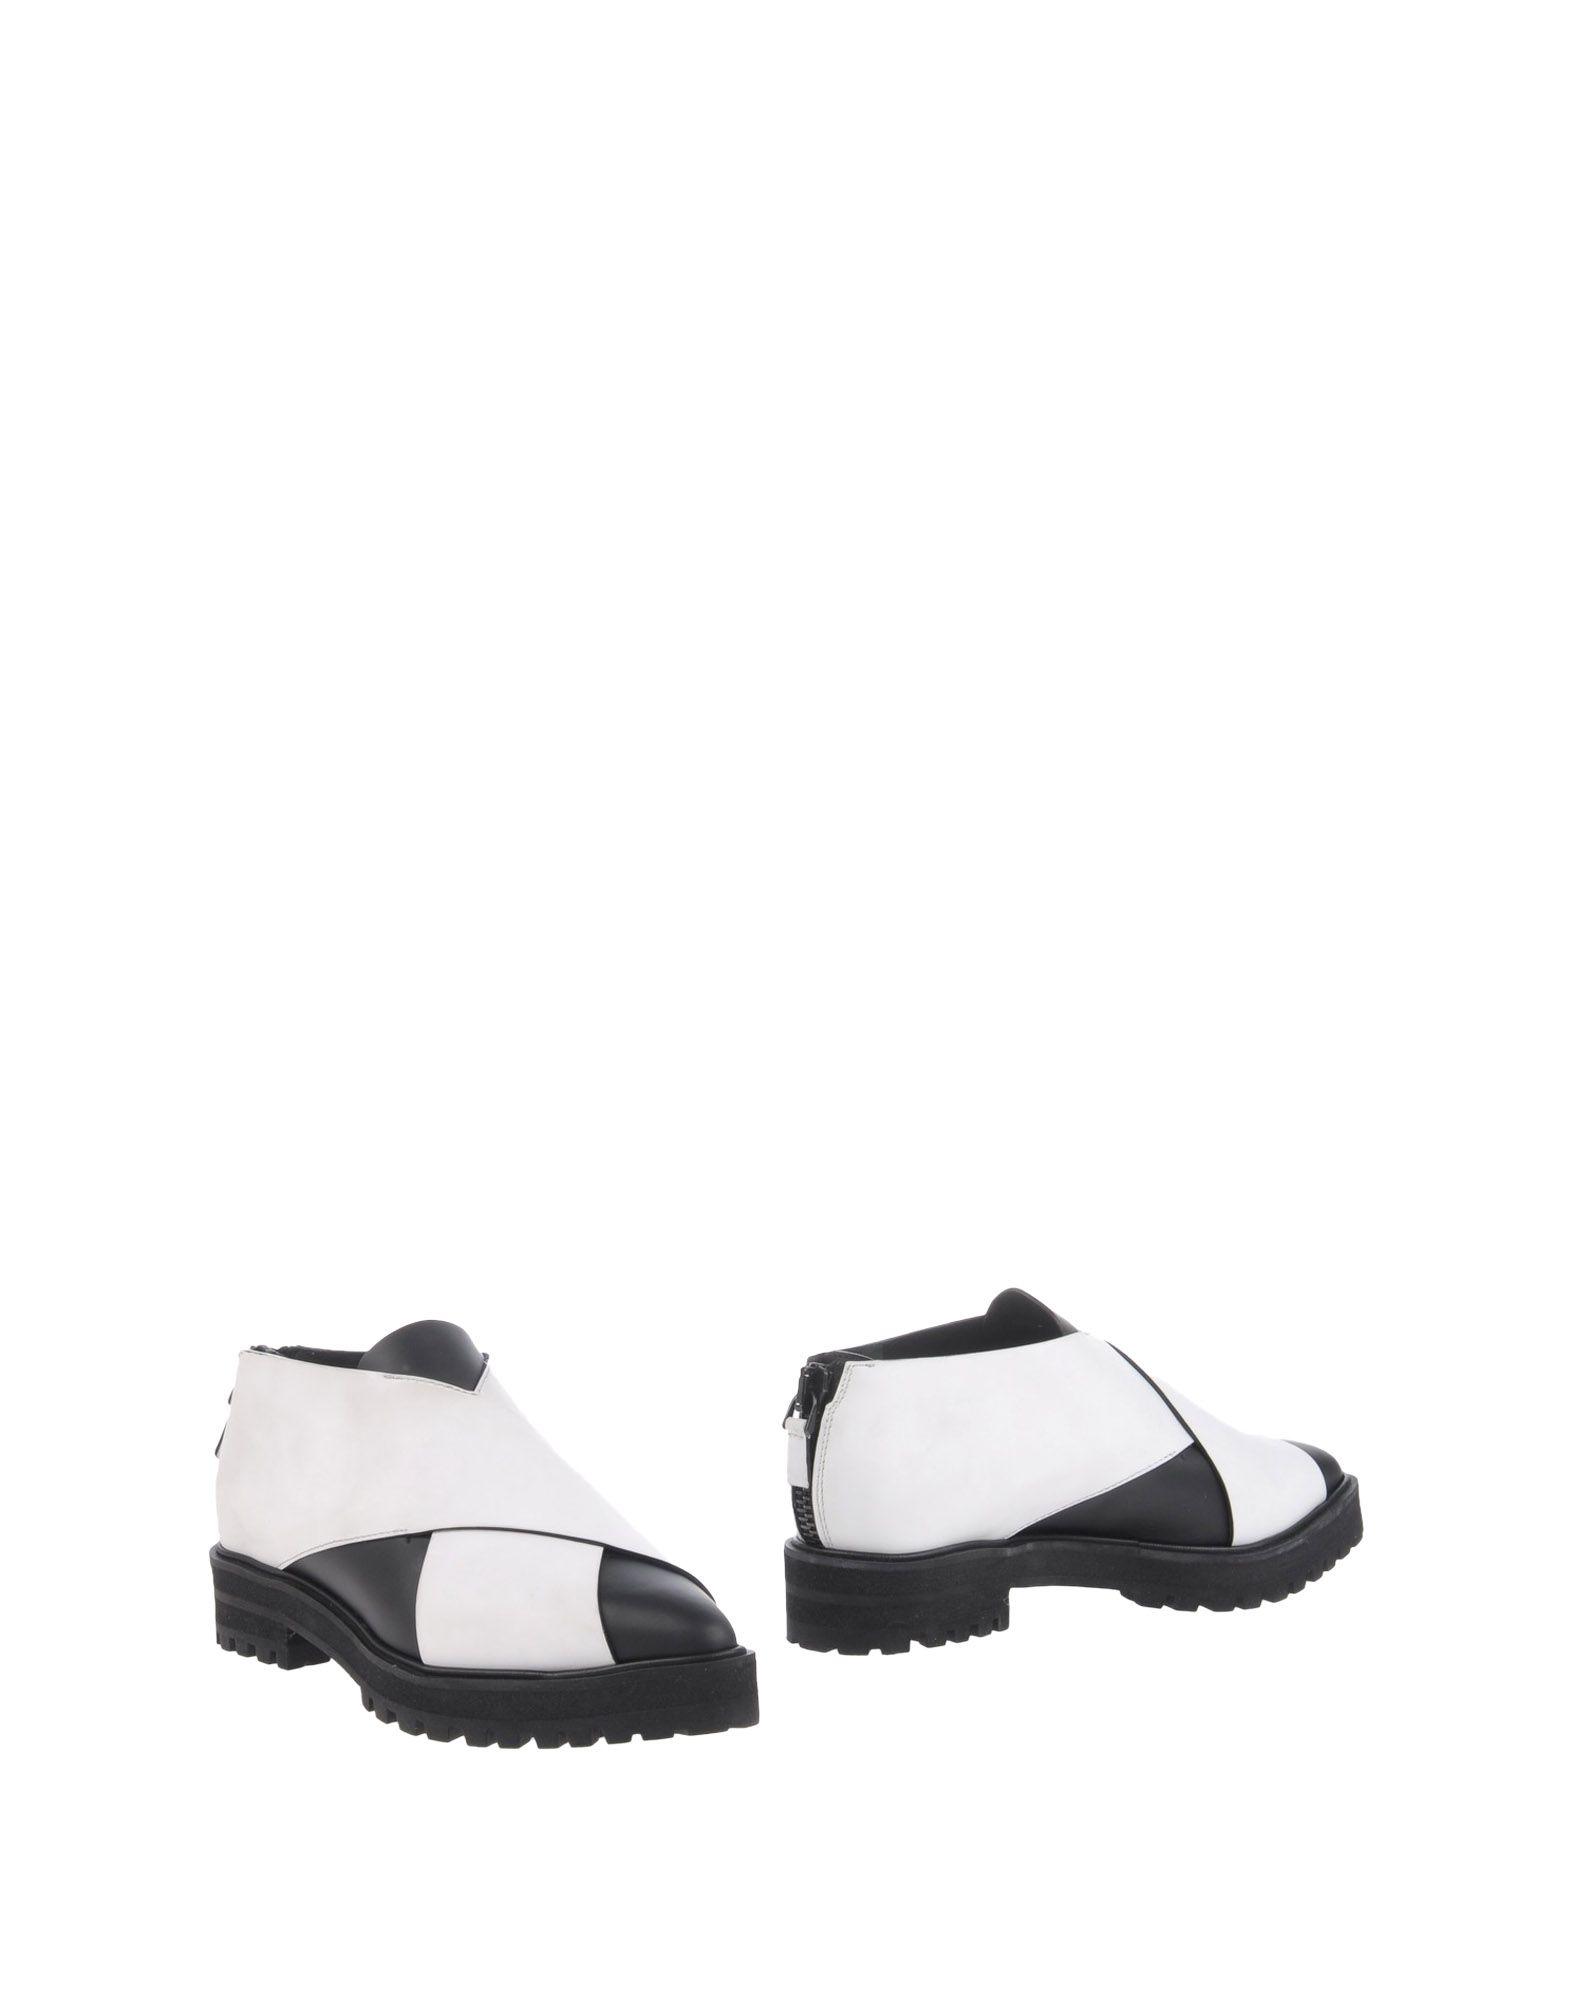 Proenza Schouler Stiefelette Damen  11204660DUGut aussehende strapazierfähige Schuhe